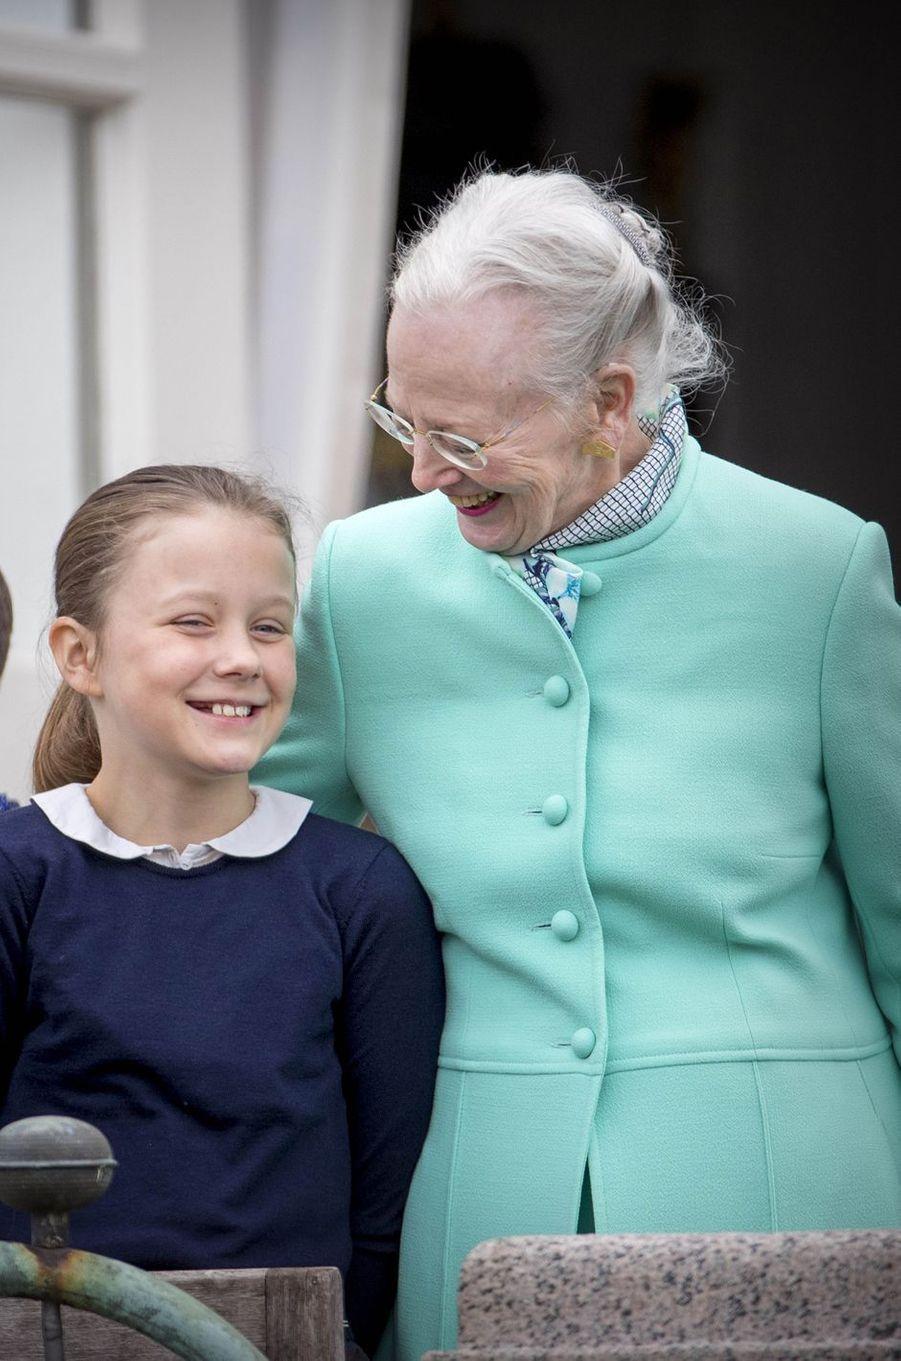 La reine Margrethe II de Danemark et la princesse Isabella à Marselisborg, le 15 avril 2017